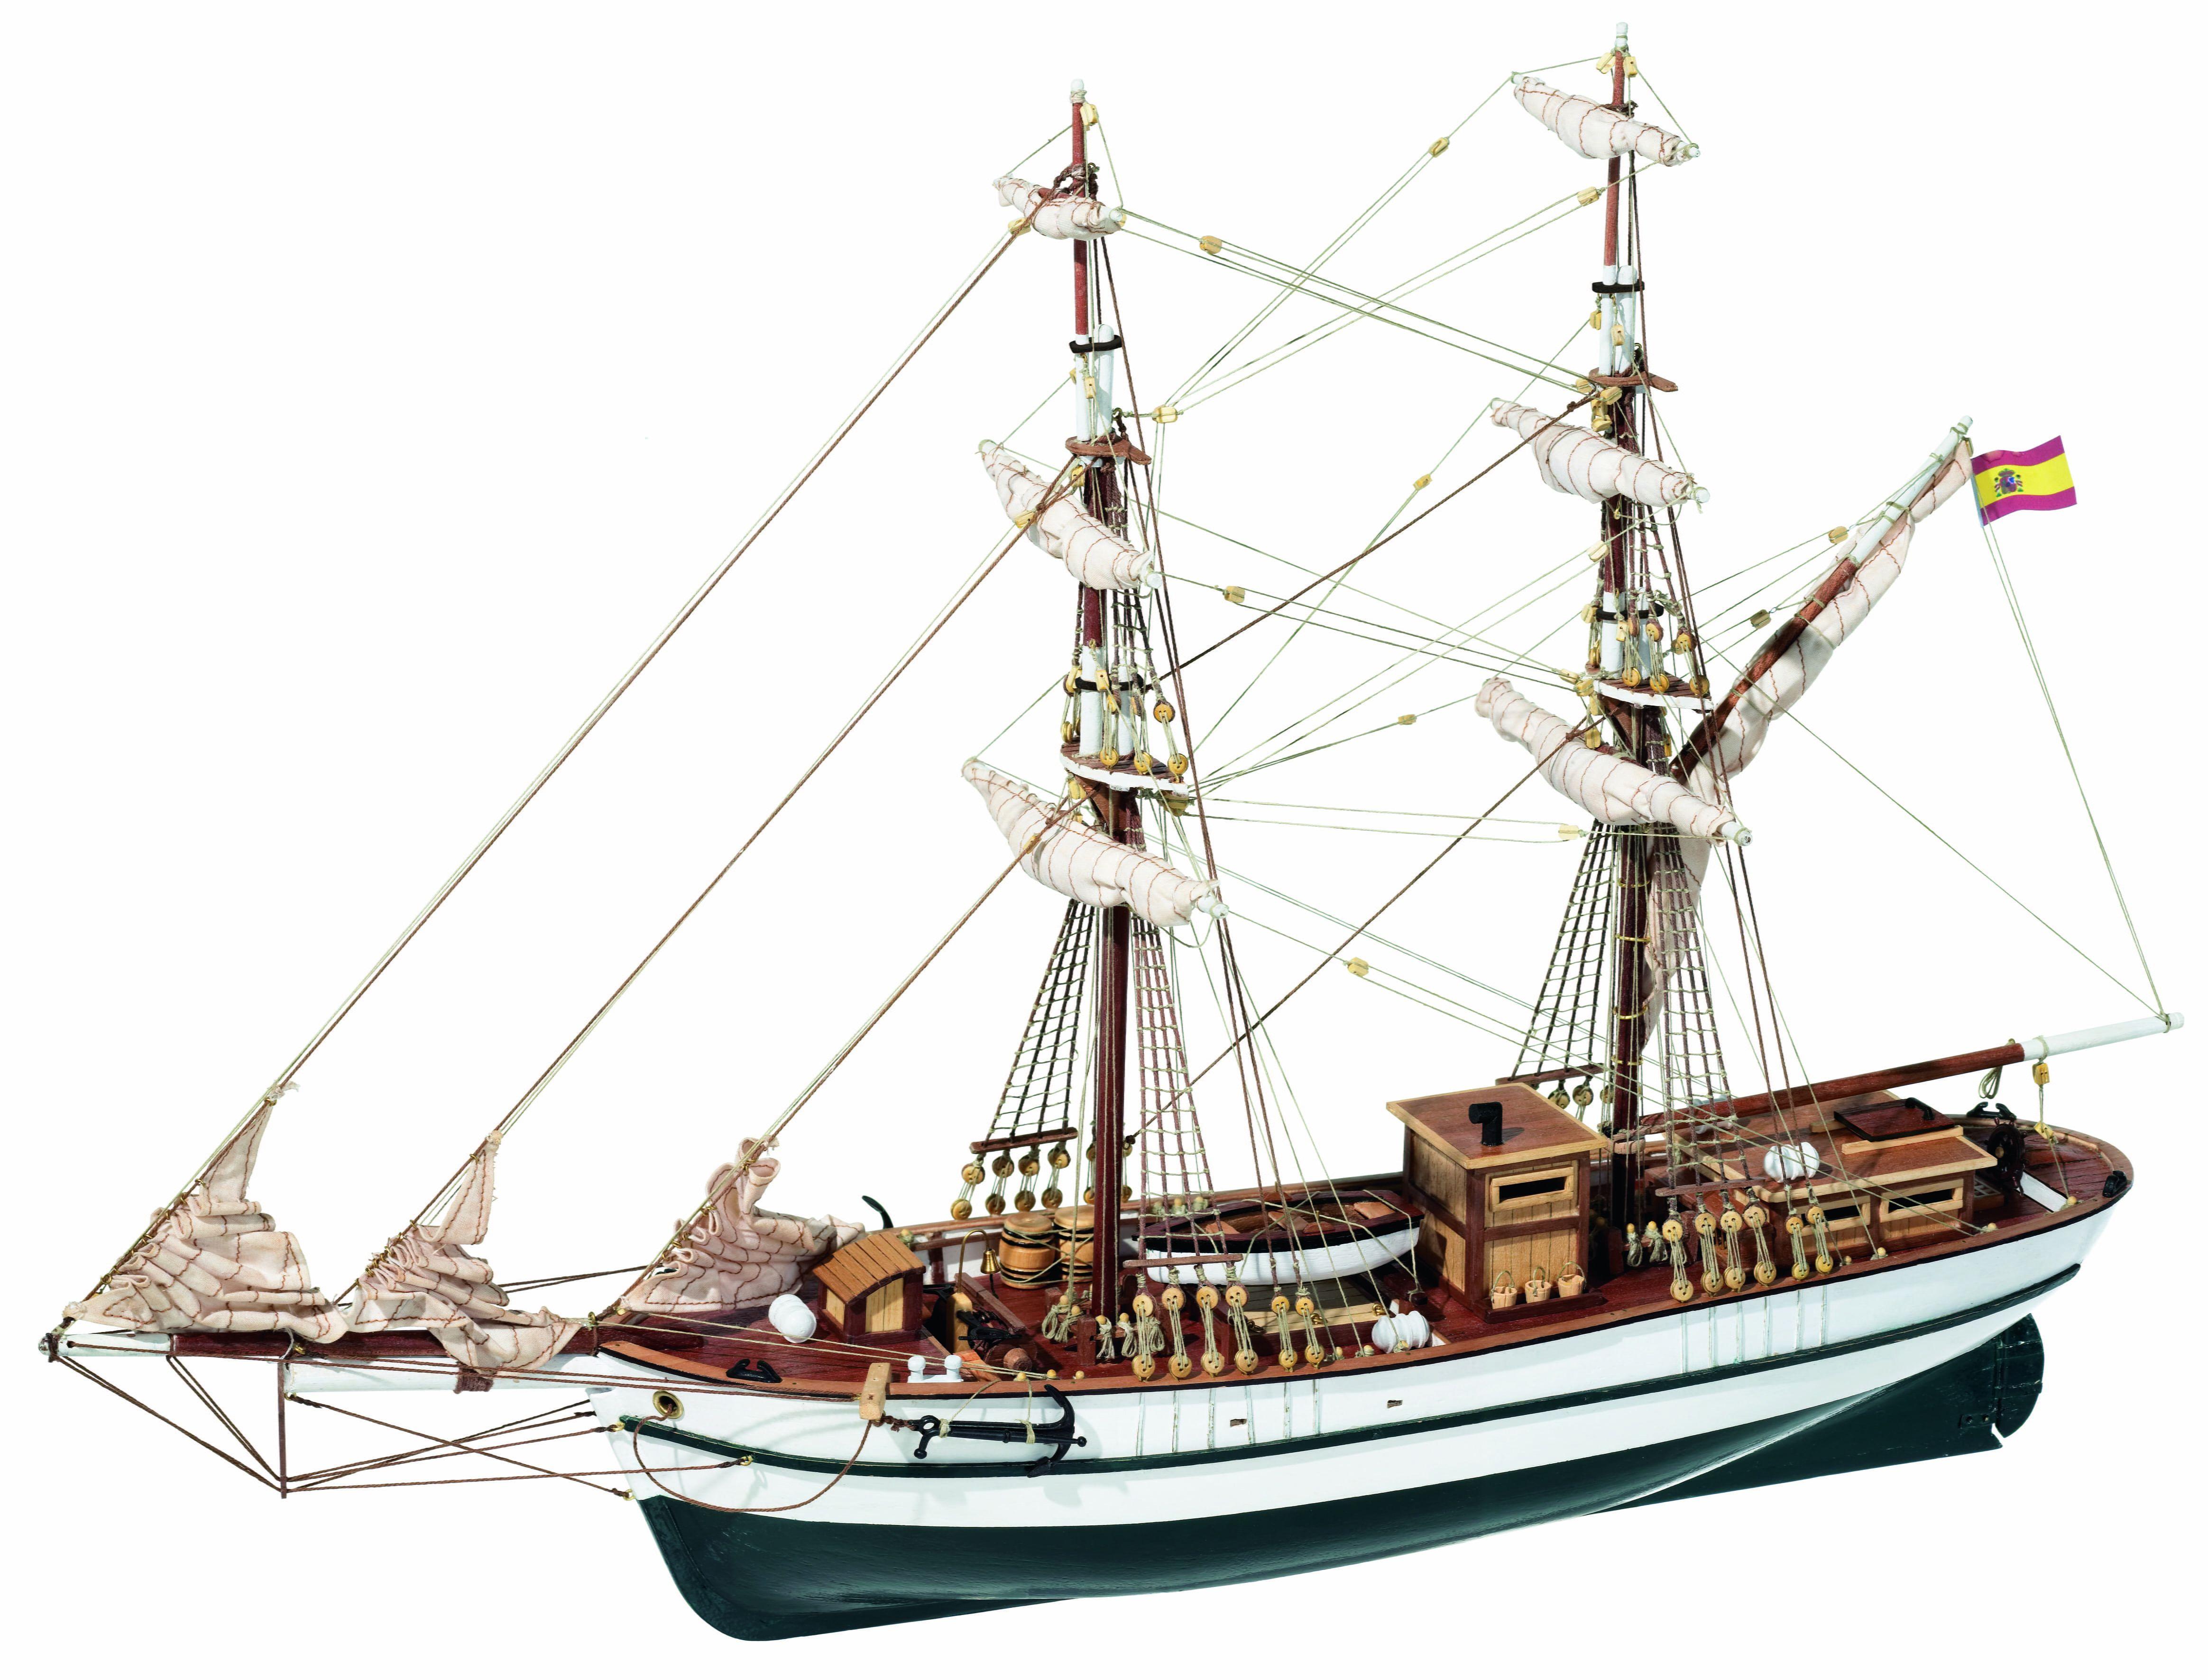 Occre Aurora Brig 1:65th Scale Model Boat Display Kit